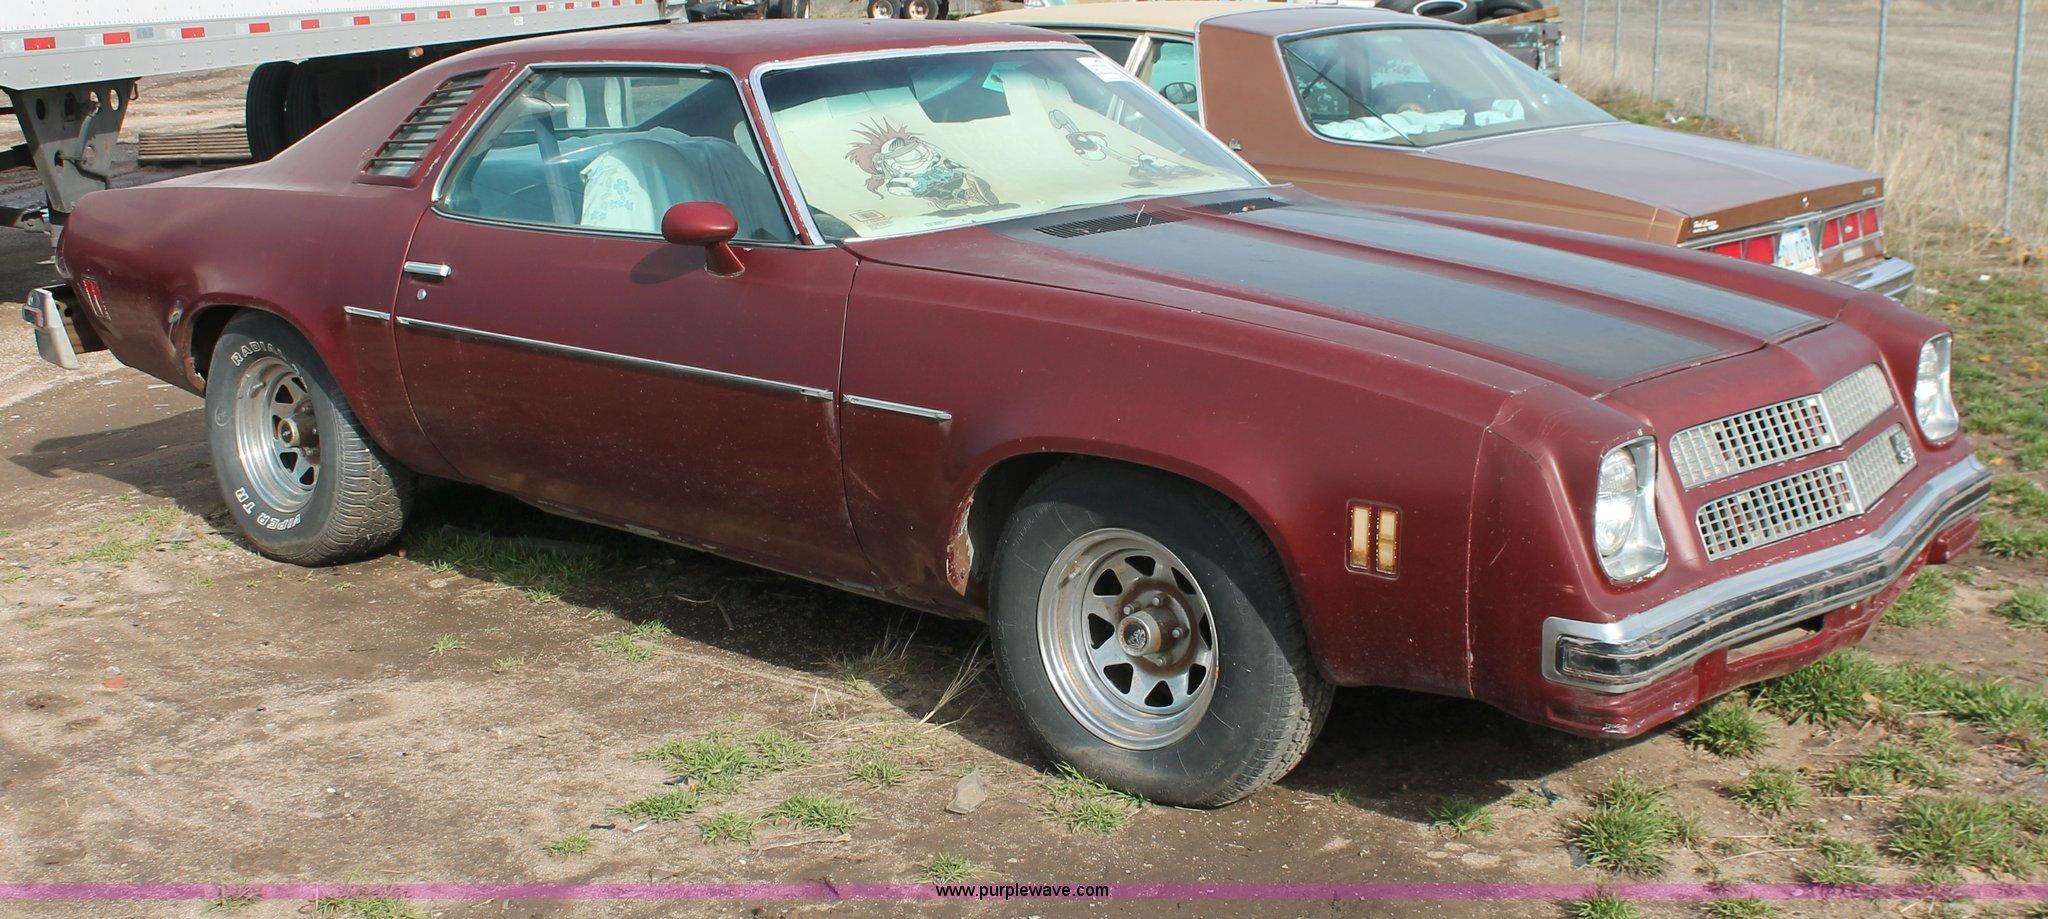 All Chevy 1976 chevy laguna : 1976 Chevrolet Laguna S3 | Item E3198 | SOLD! March 19 City ...